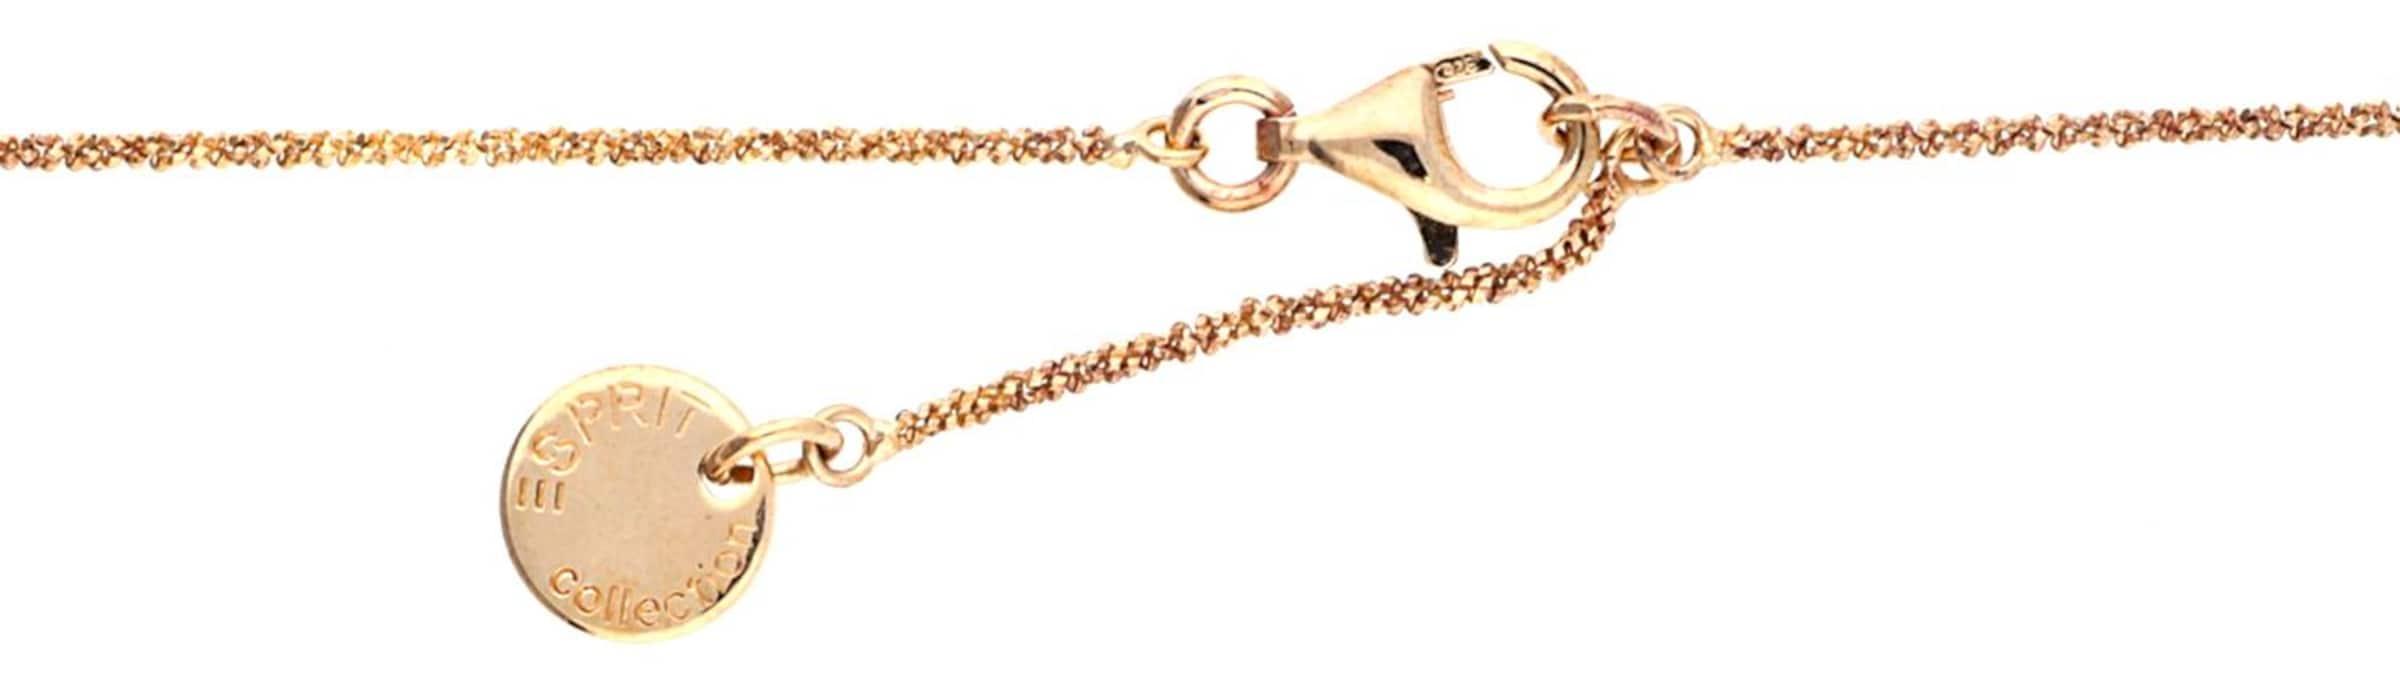 ESPRIT Silberkette 'Pelia ELNL92745B420' Preiswerte Neue KKytr